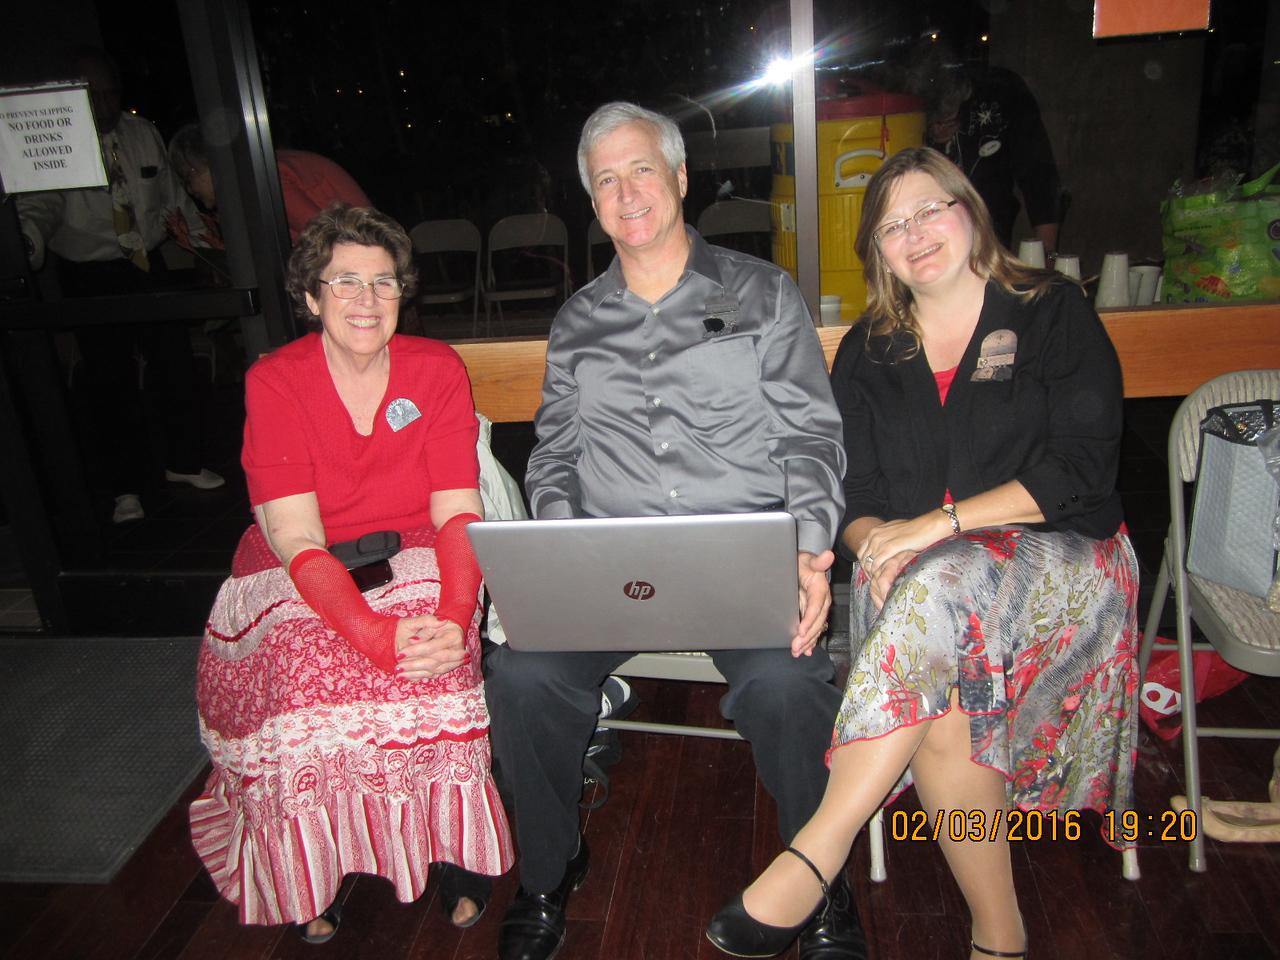 Judy Keller Smith with Dan & Allison